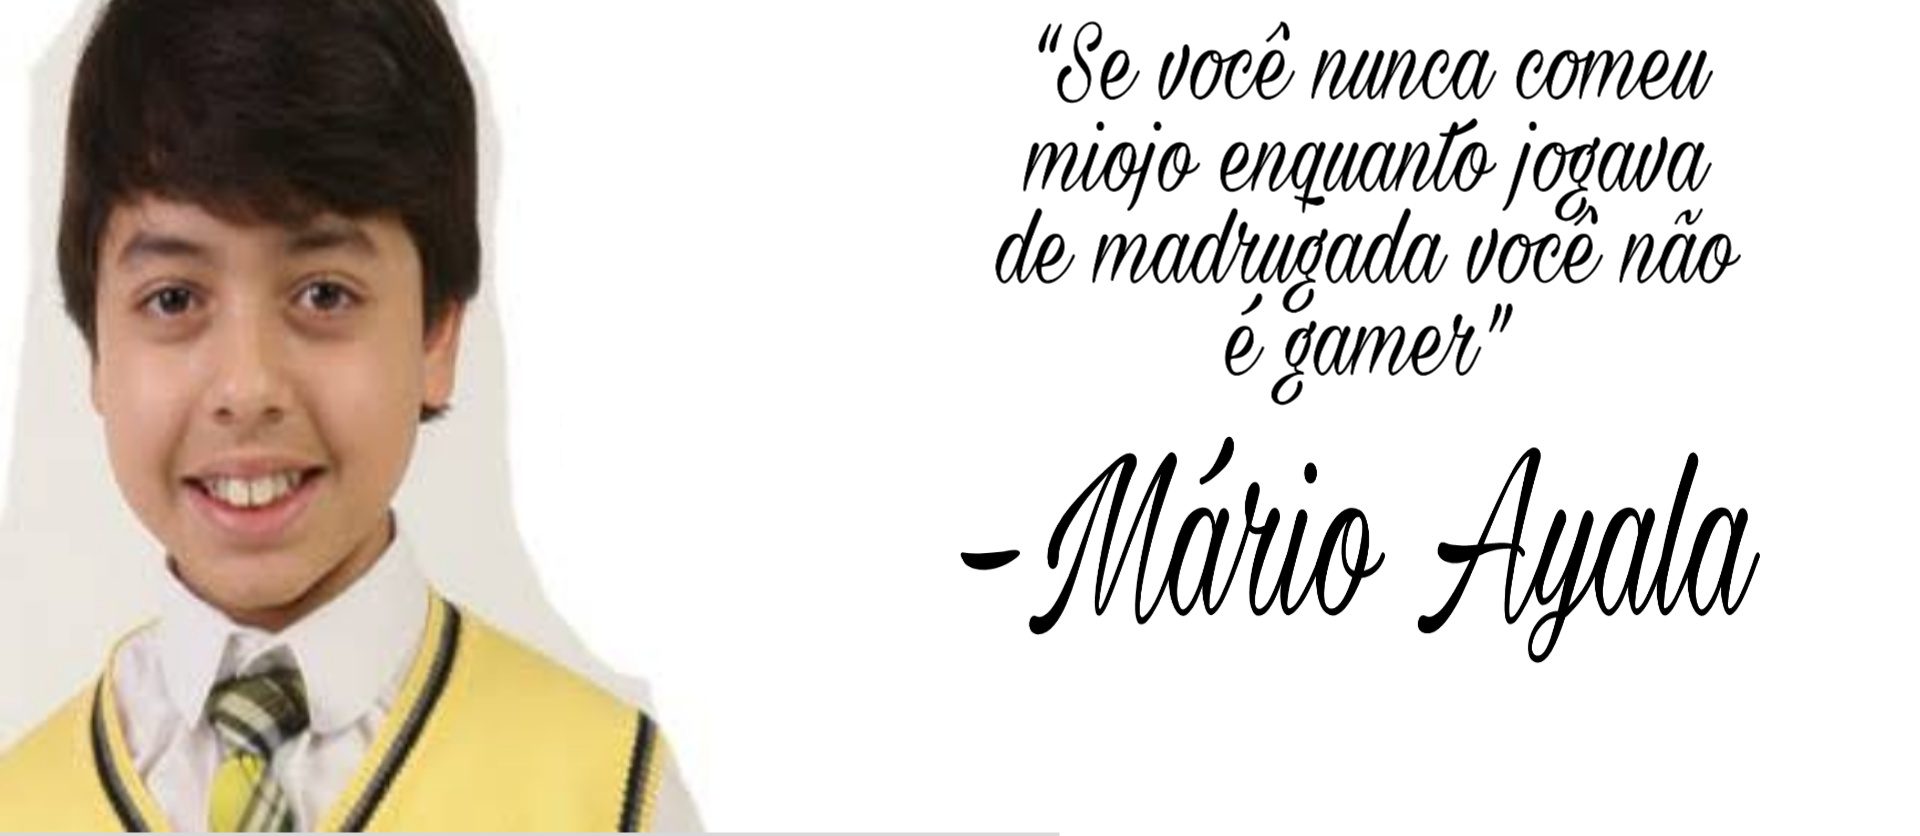 Mario ayala falou (Nescau putaum, positiva ae consagrado) - meme